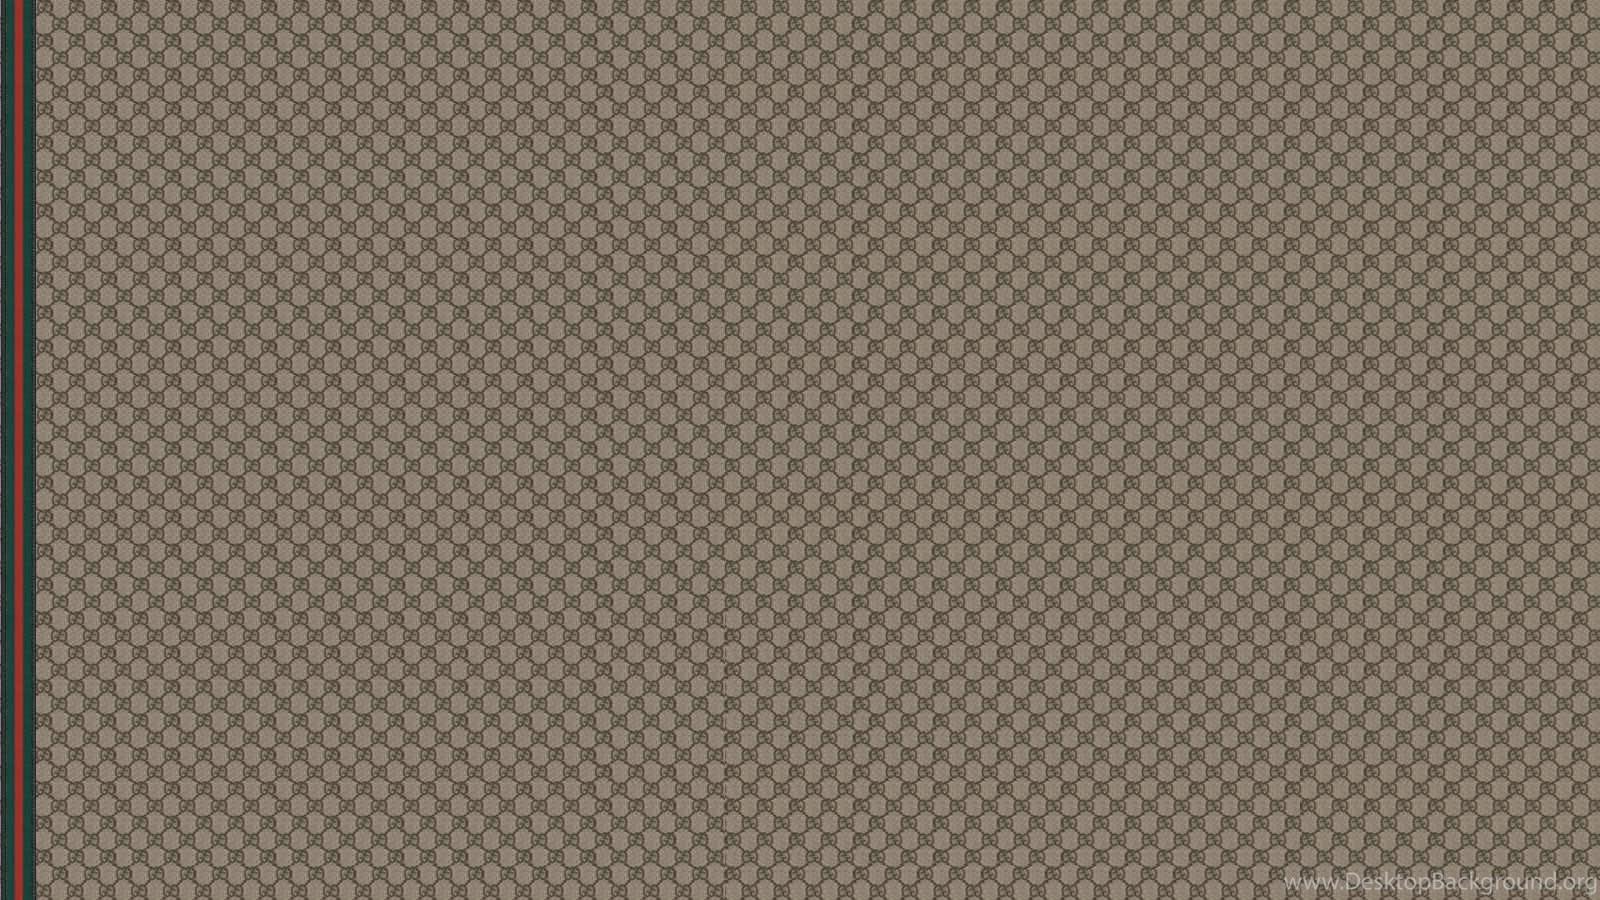 Wallpapers pattern gucci for 1600x900 desktop background - Gucci desktop wallpaper ...